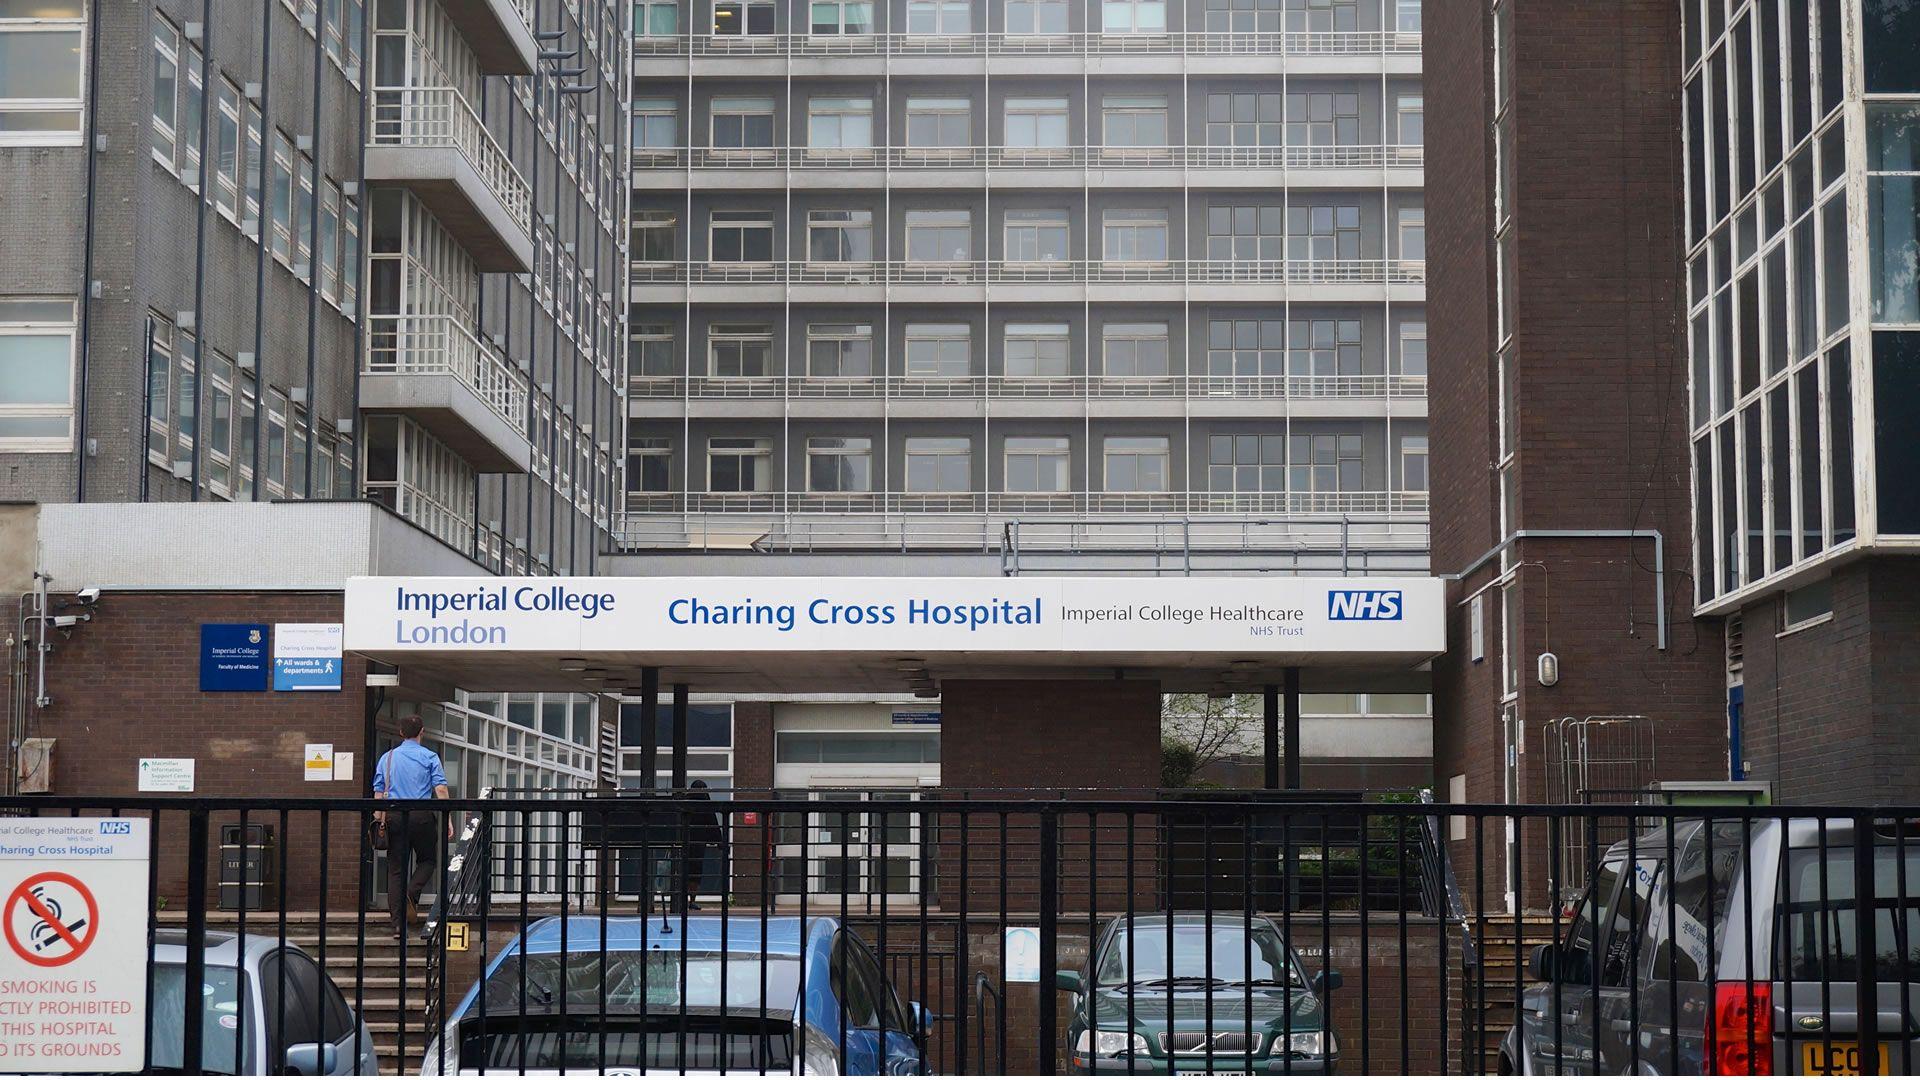 Charing Cross Hospital (Londres) - Por Ted Eytan en Flickr in 2020 ...